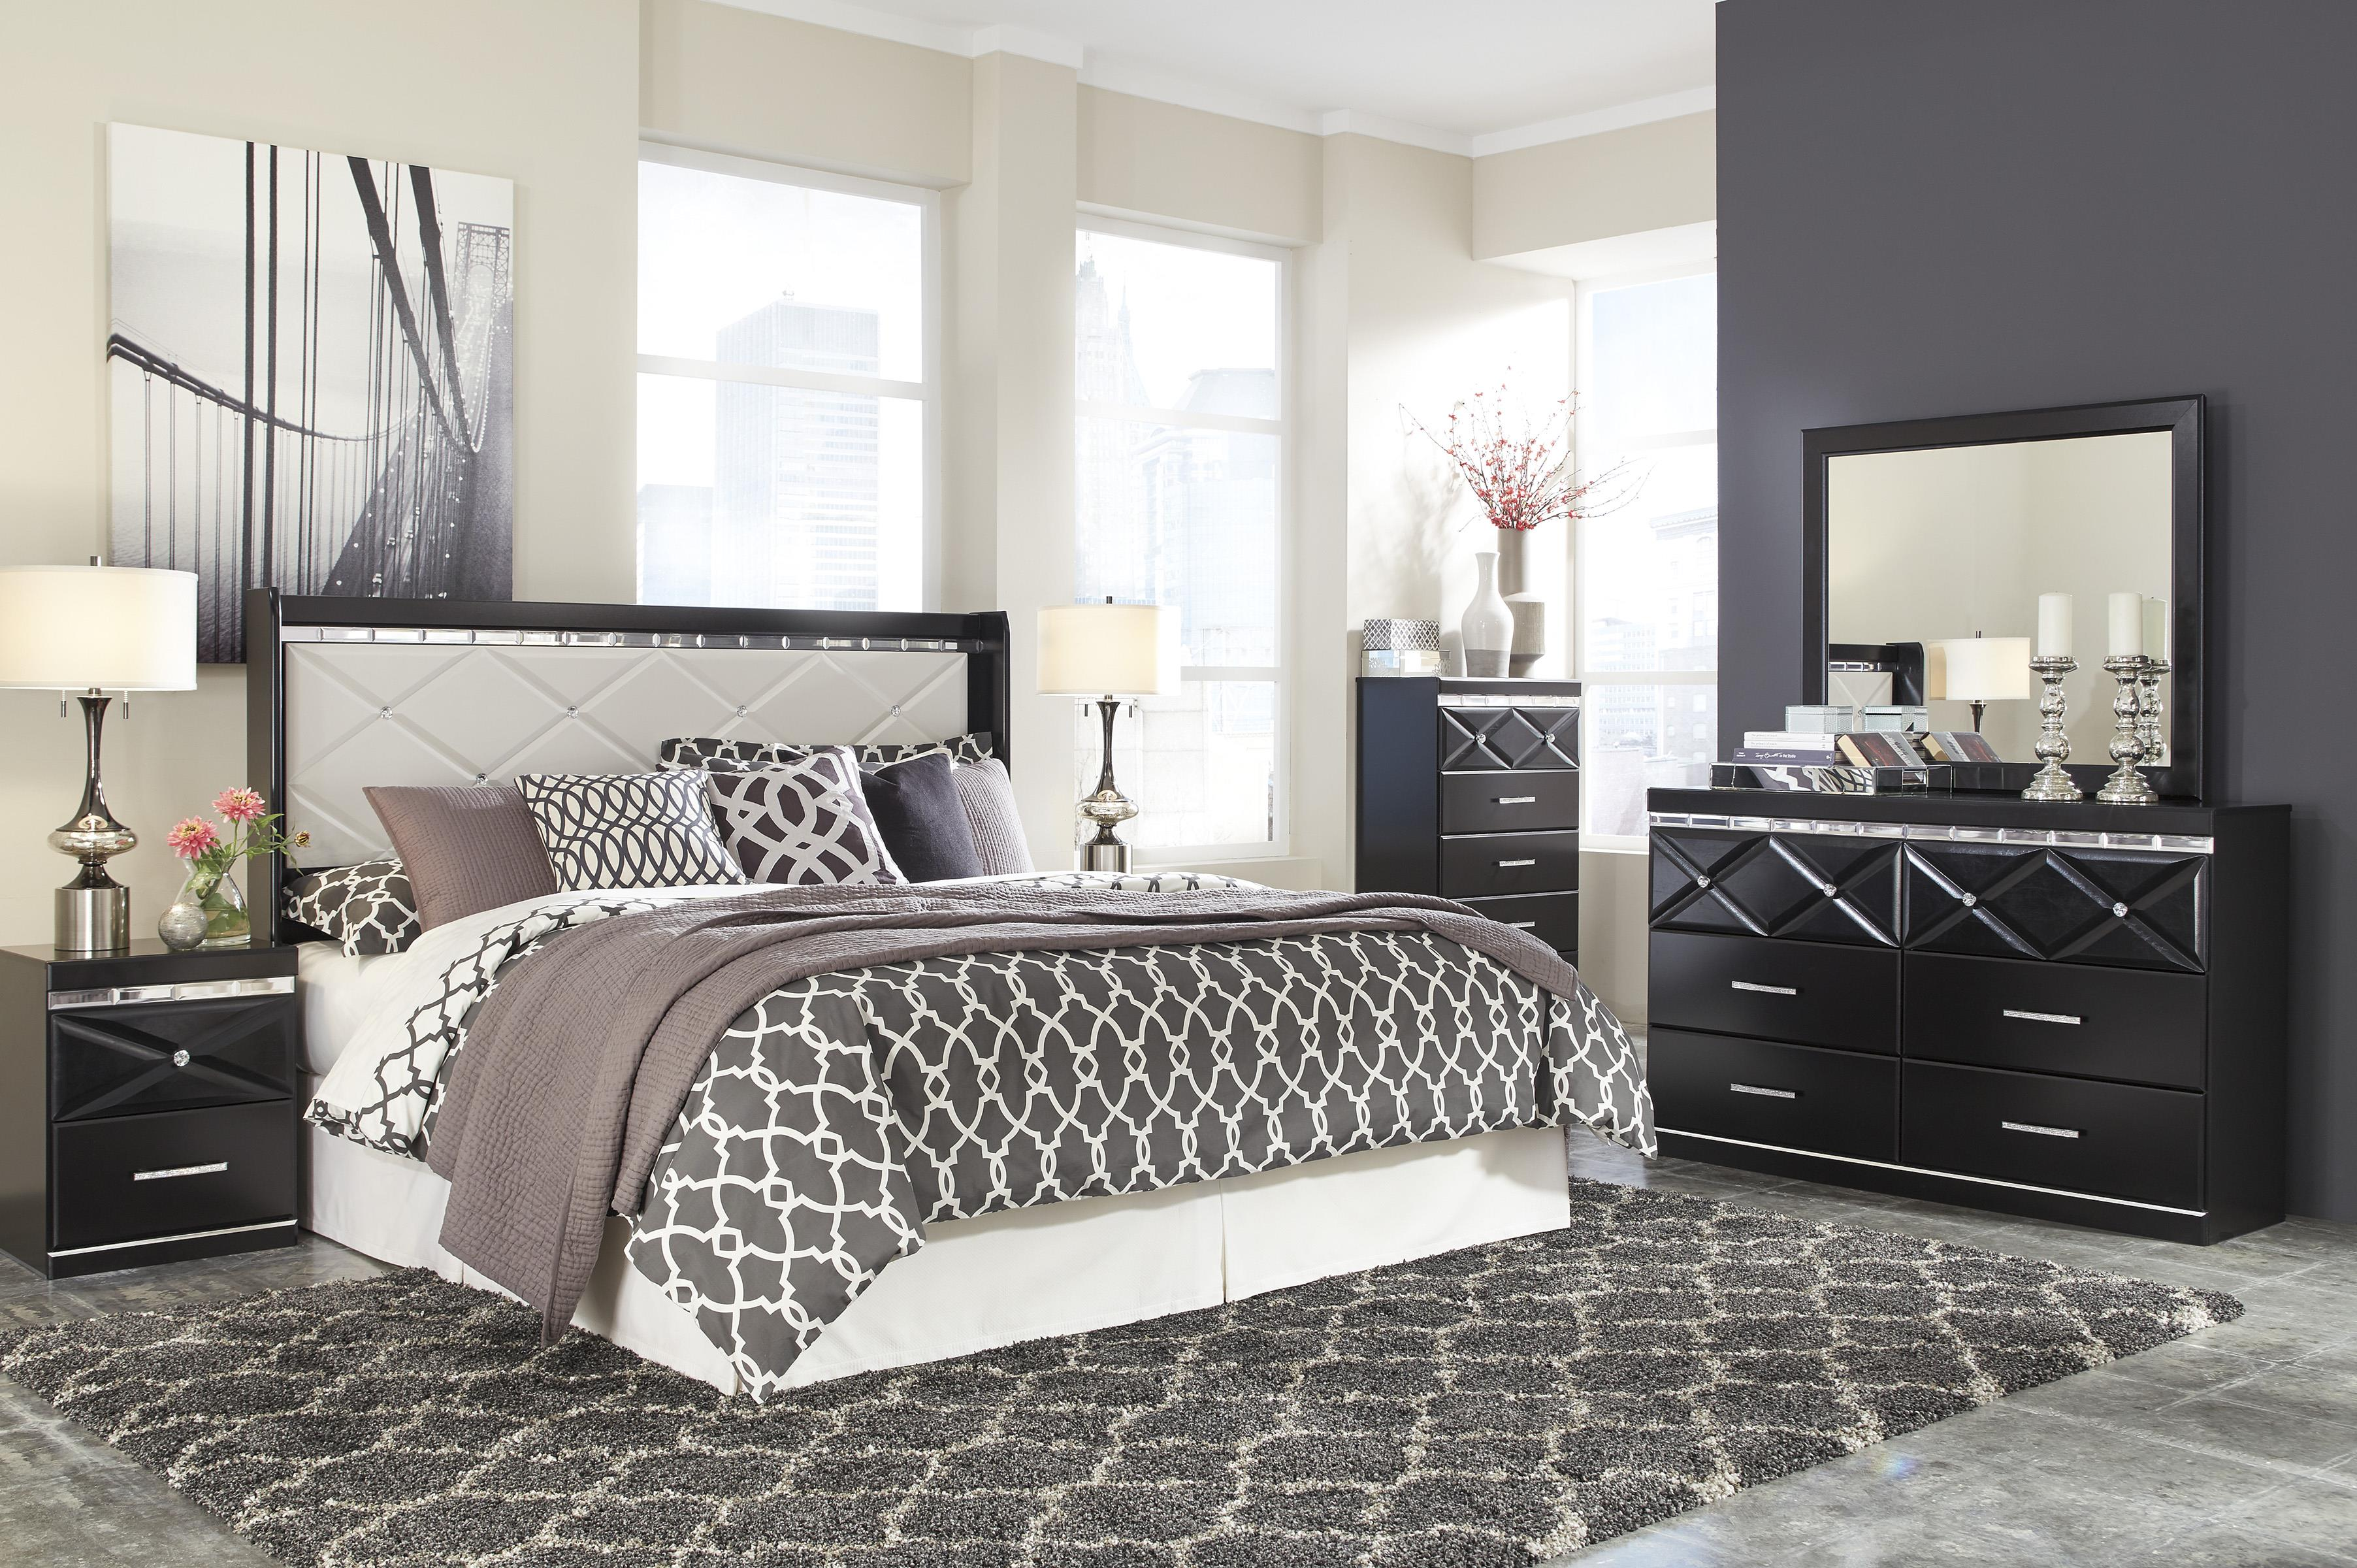 Fancee B348 By Signature Design By Ashley Del Sol Furniture Signature Design By Ashley